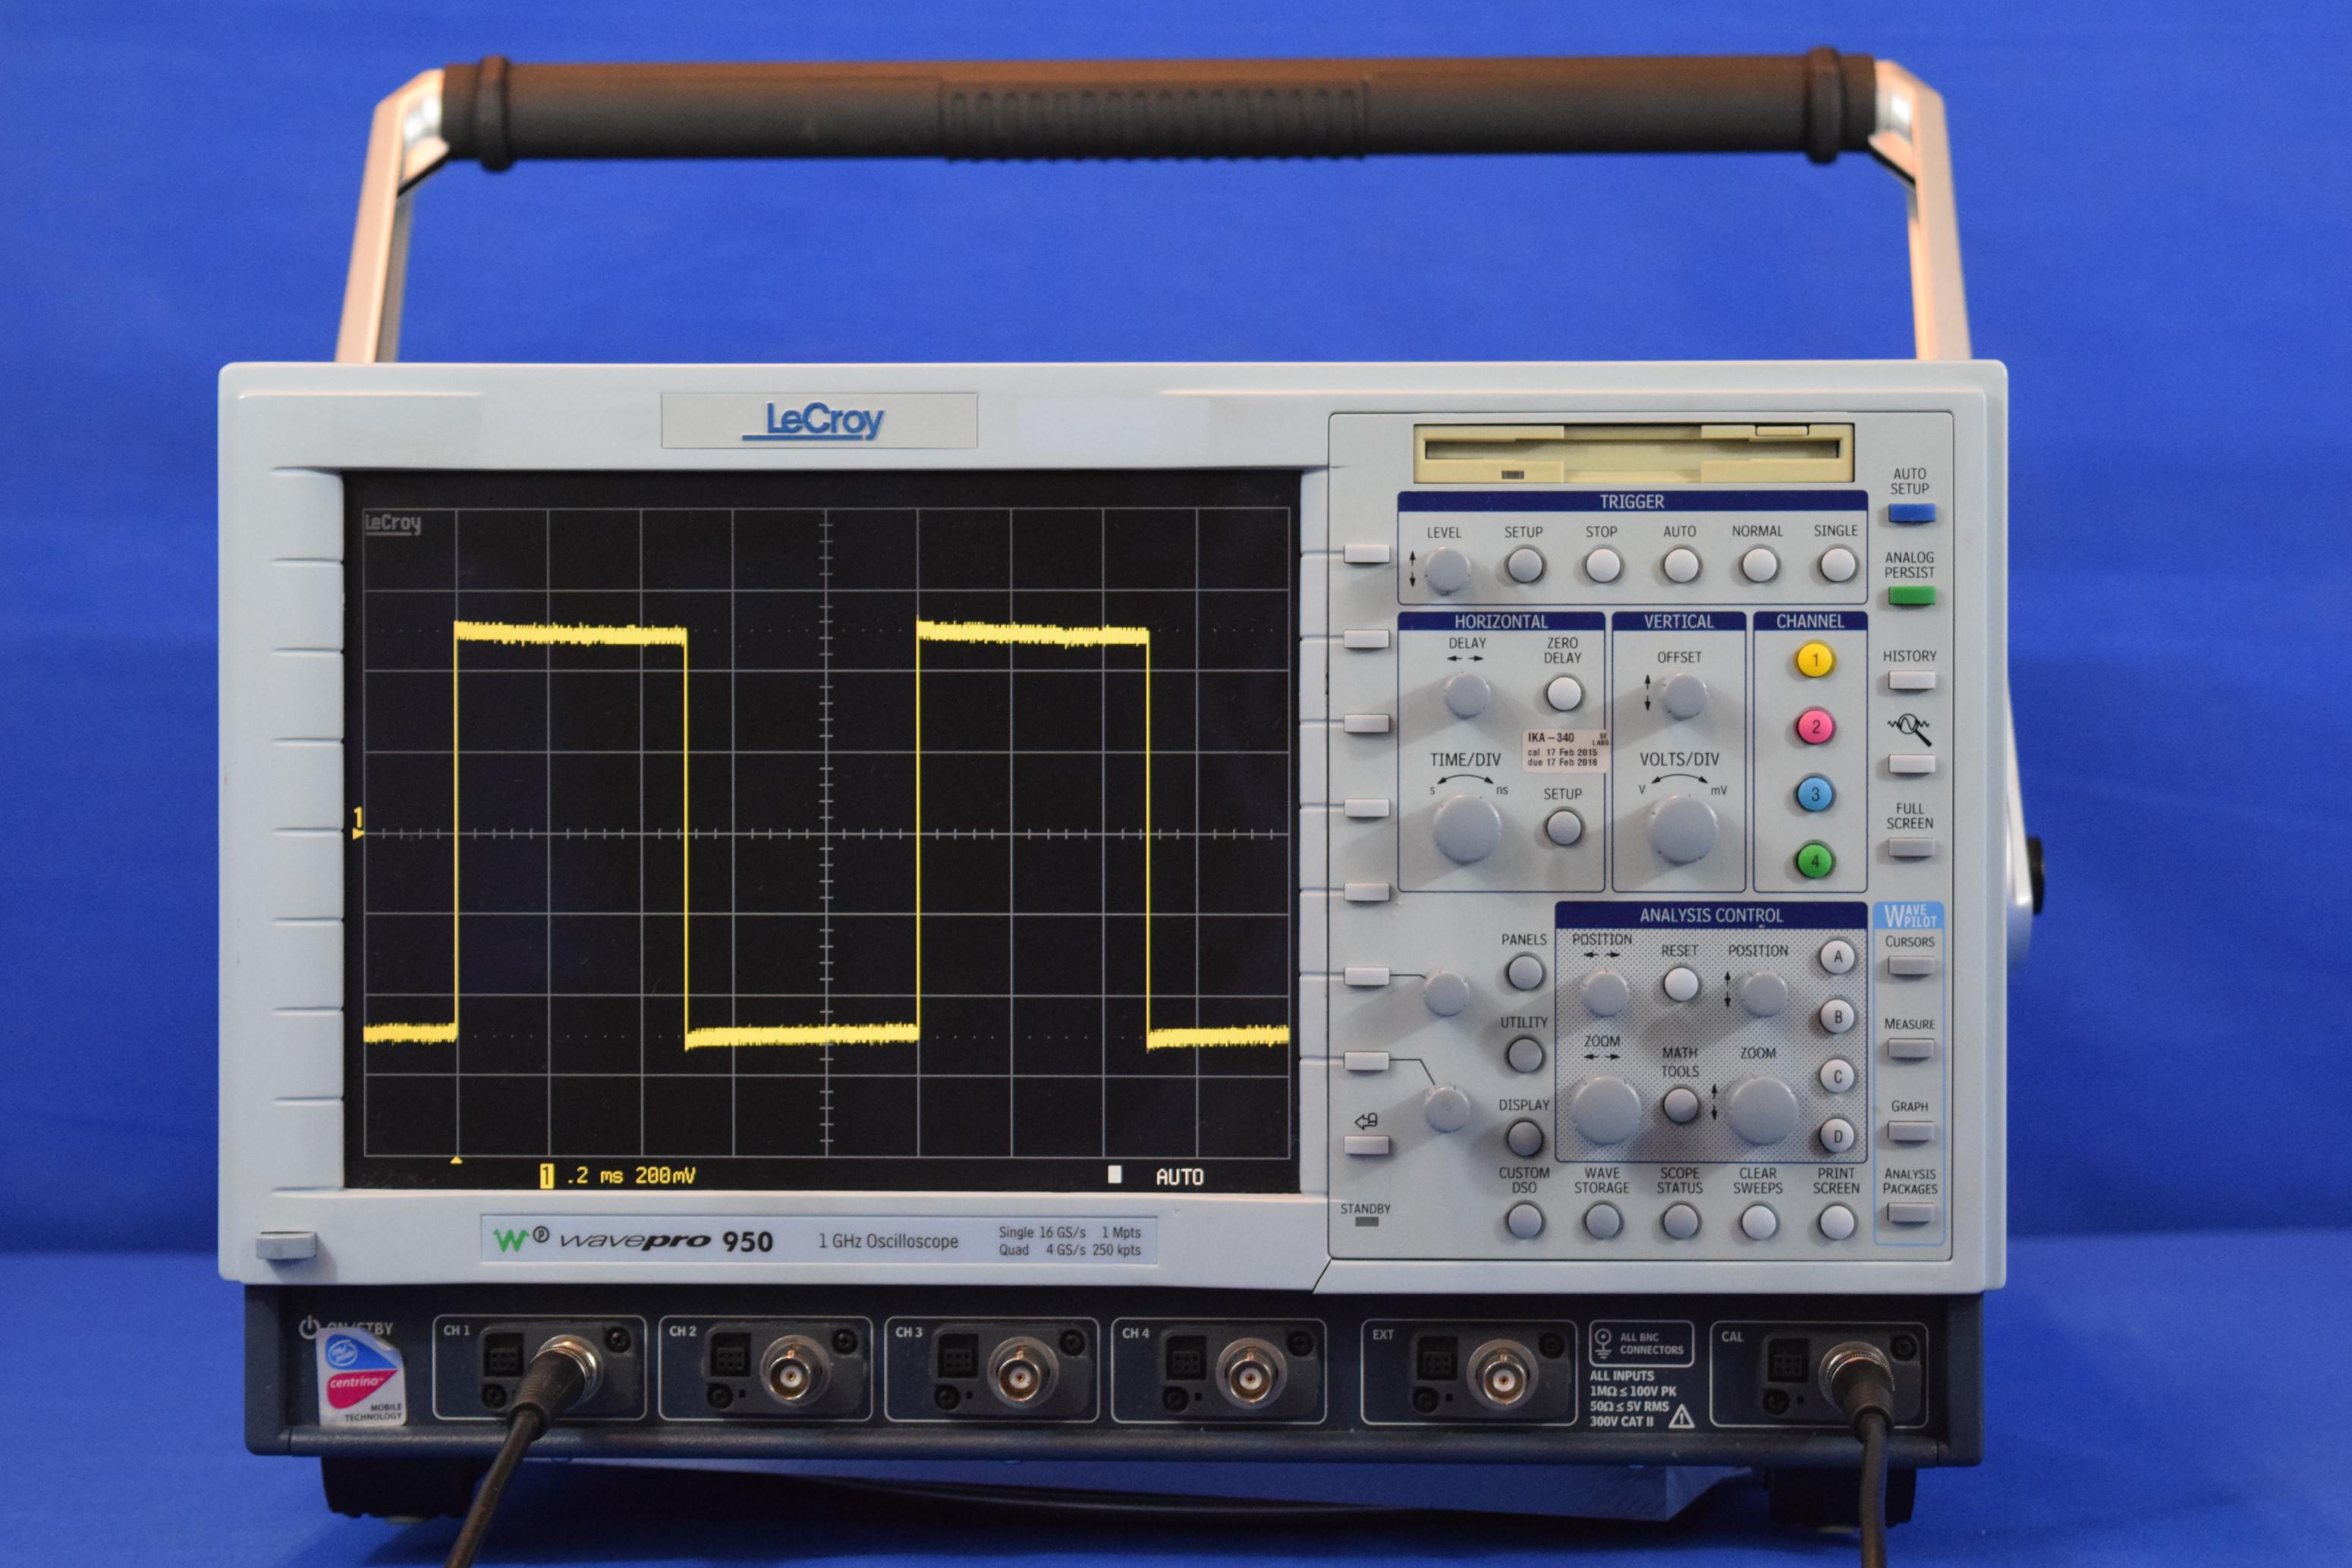 Oscilloscope Pulse Measurement : Lecroy ghz gsa s ch digital oscilloscope